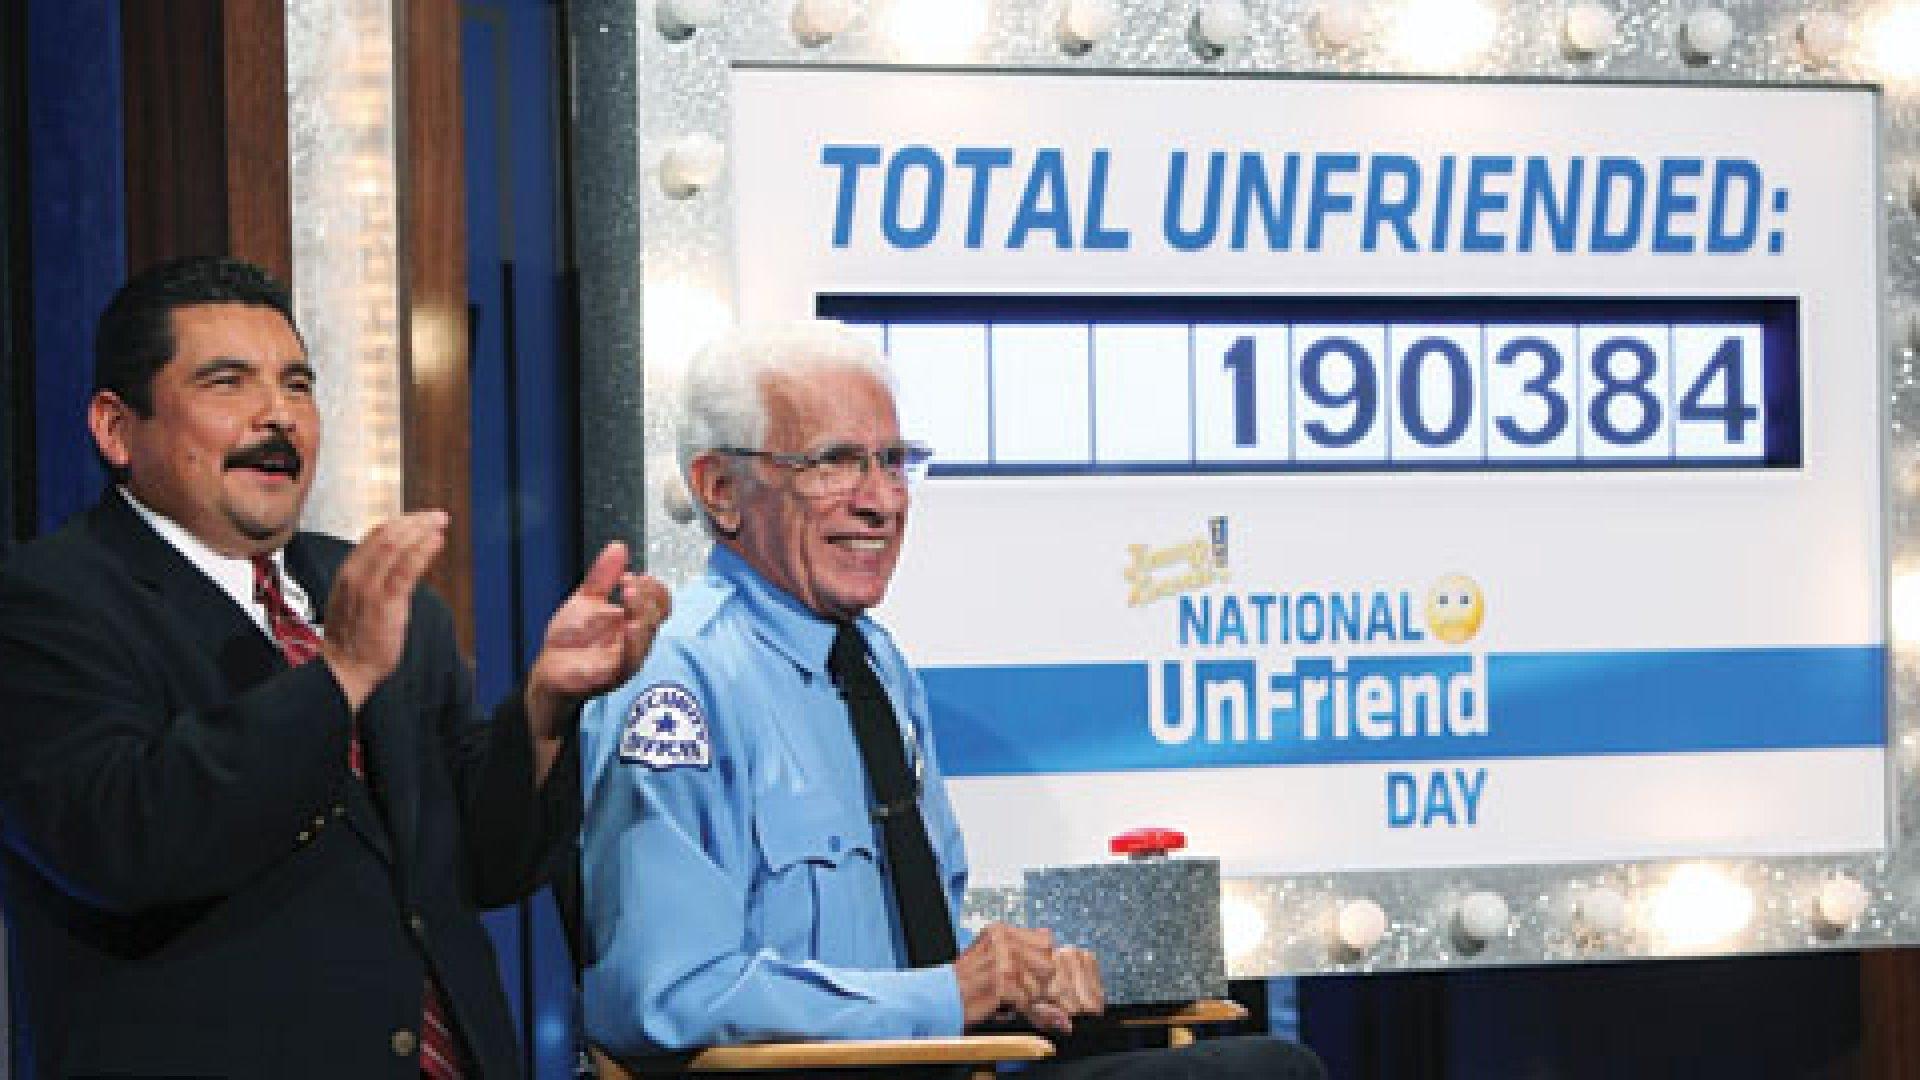 Jimmy Kimmel proclaimed November 17th as National Unfriend Day.